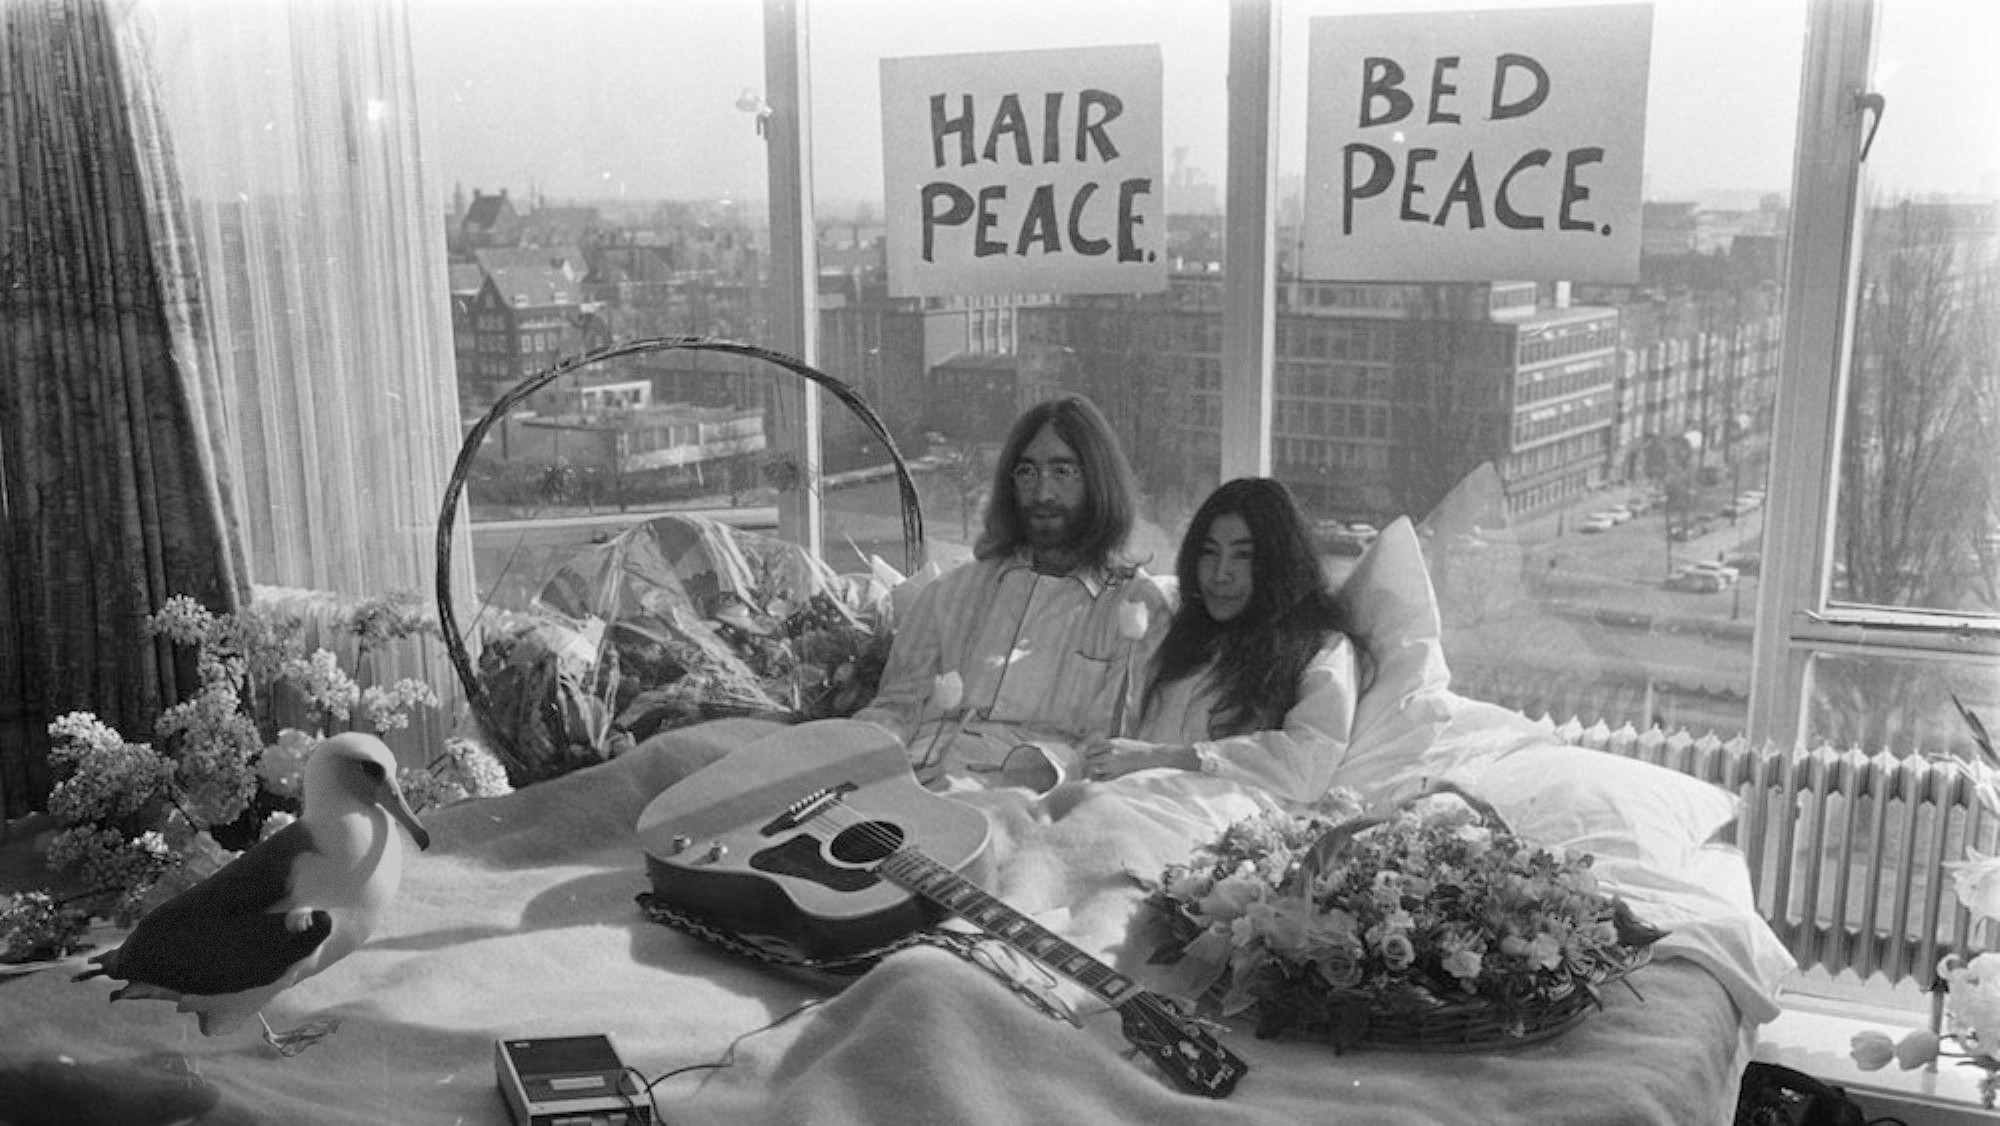 Wisdom with John and Yoko.